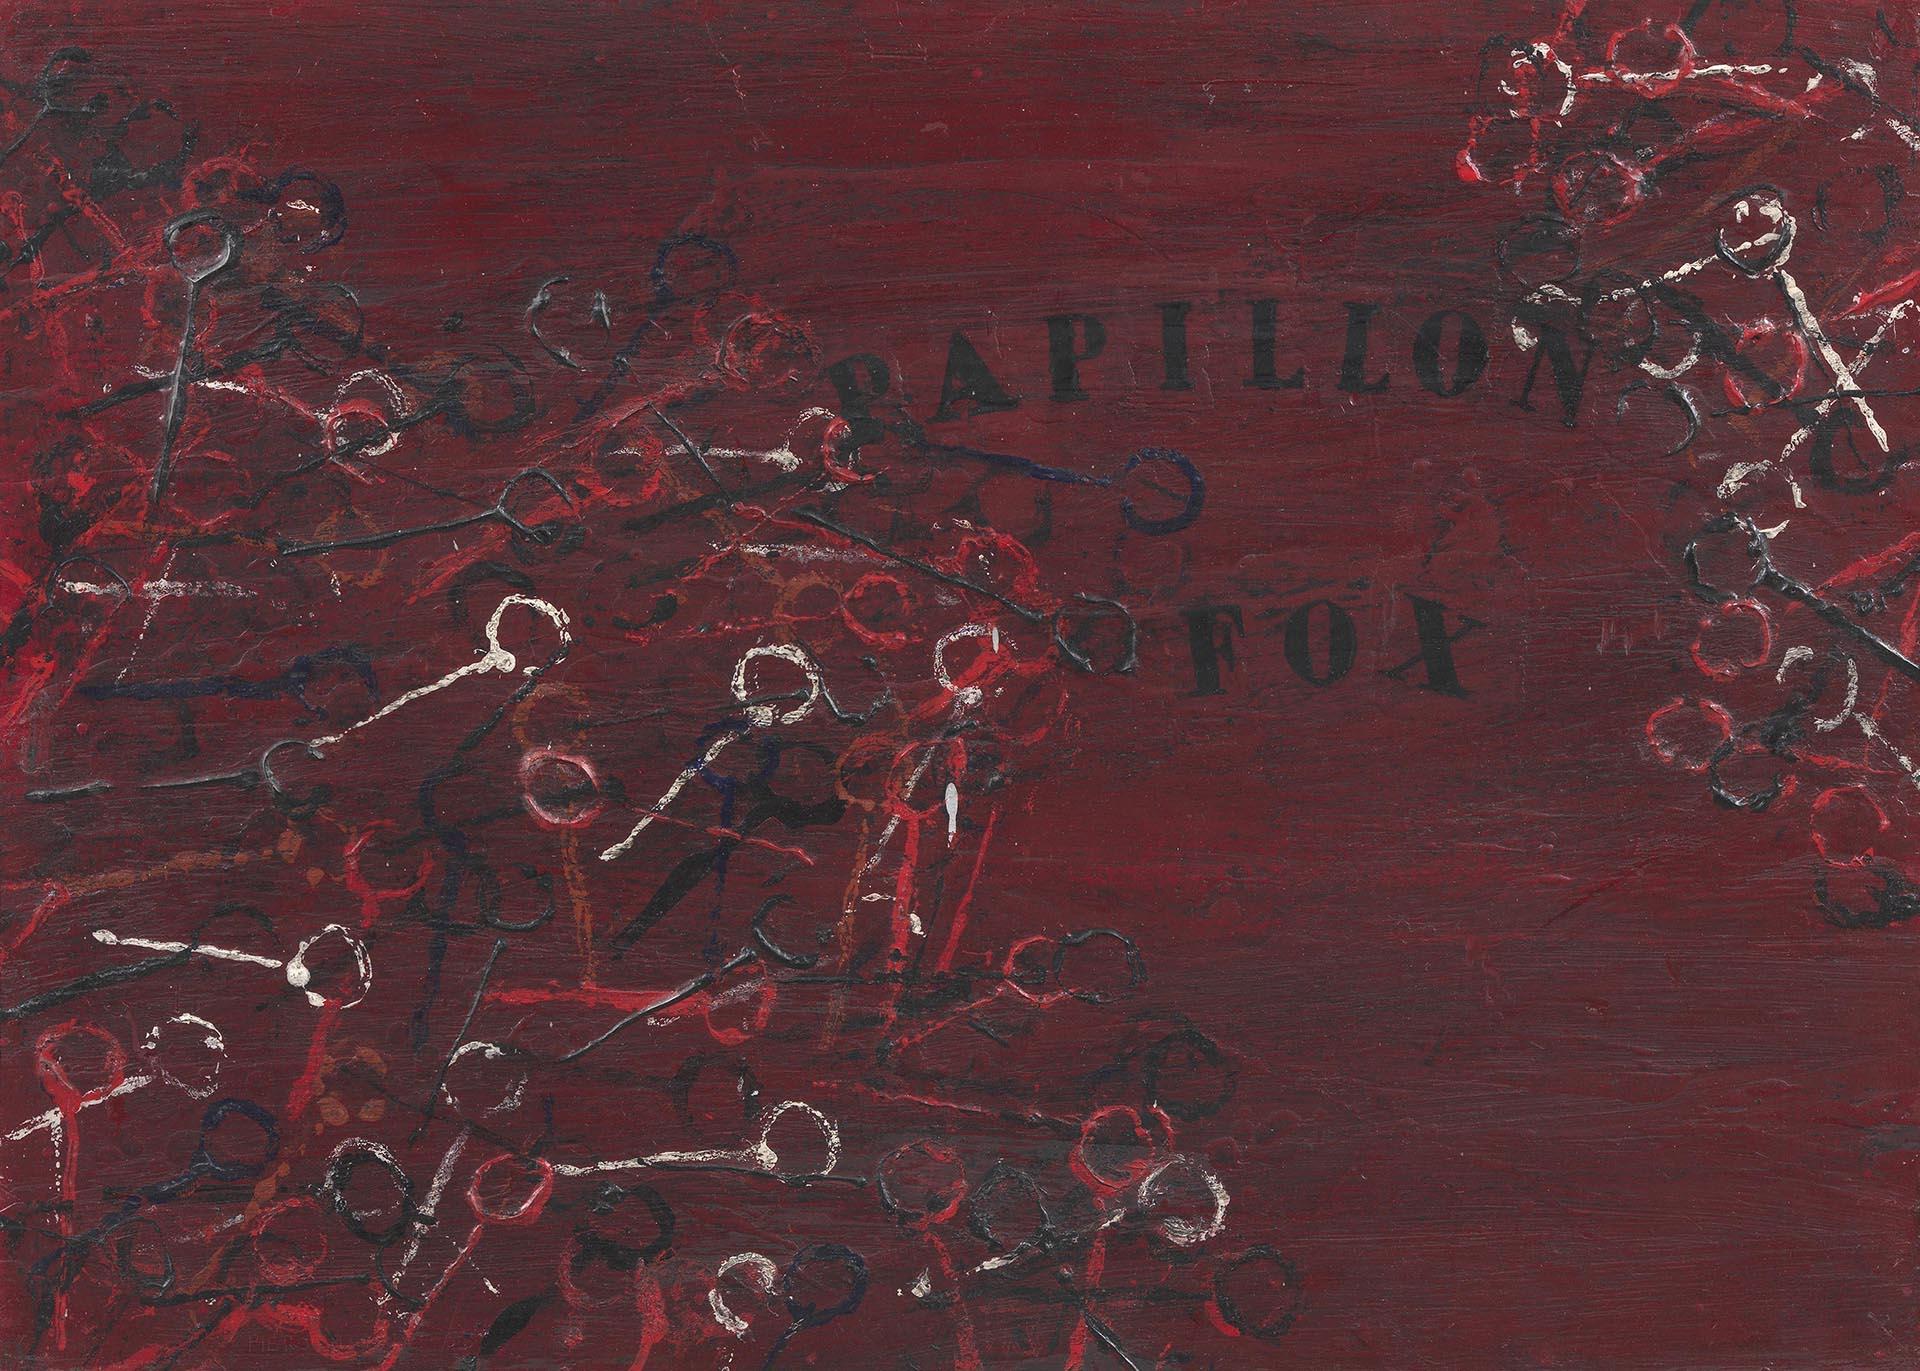 Manzoni_Papillon-fox_1956_50X70-cm